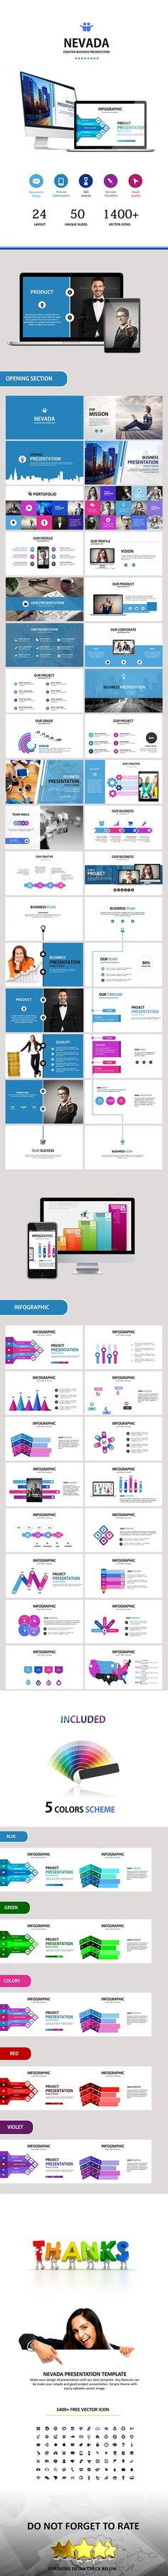 NEVADA - Powerpoint Business Presentation Template #design #slides Download: http://graphicriver.net/item/nevada-powerpoint-business-presentation/12503509?ref=ksioks